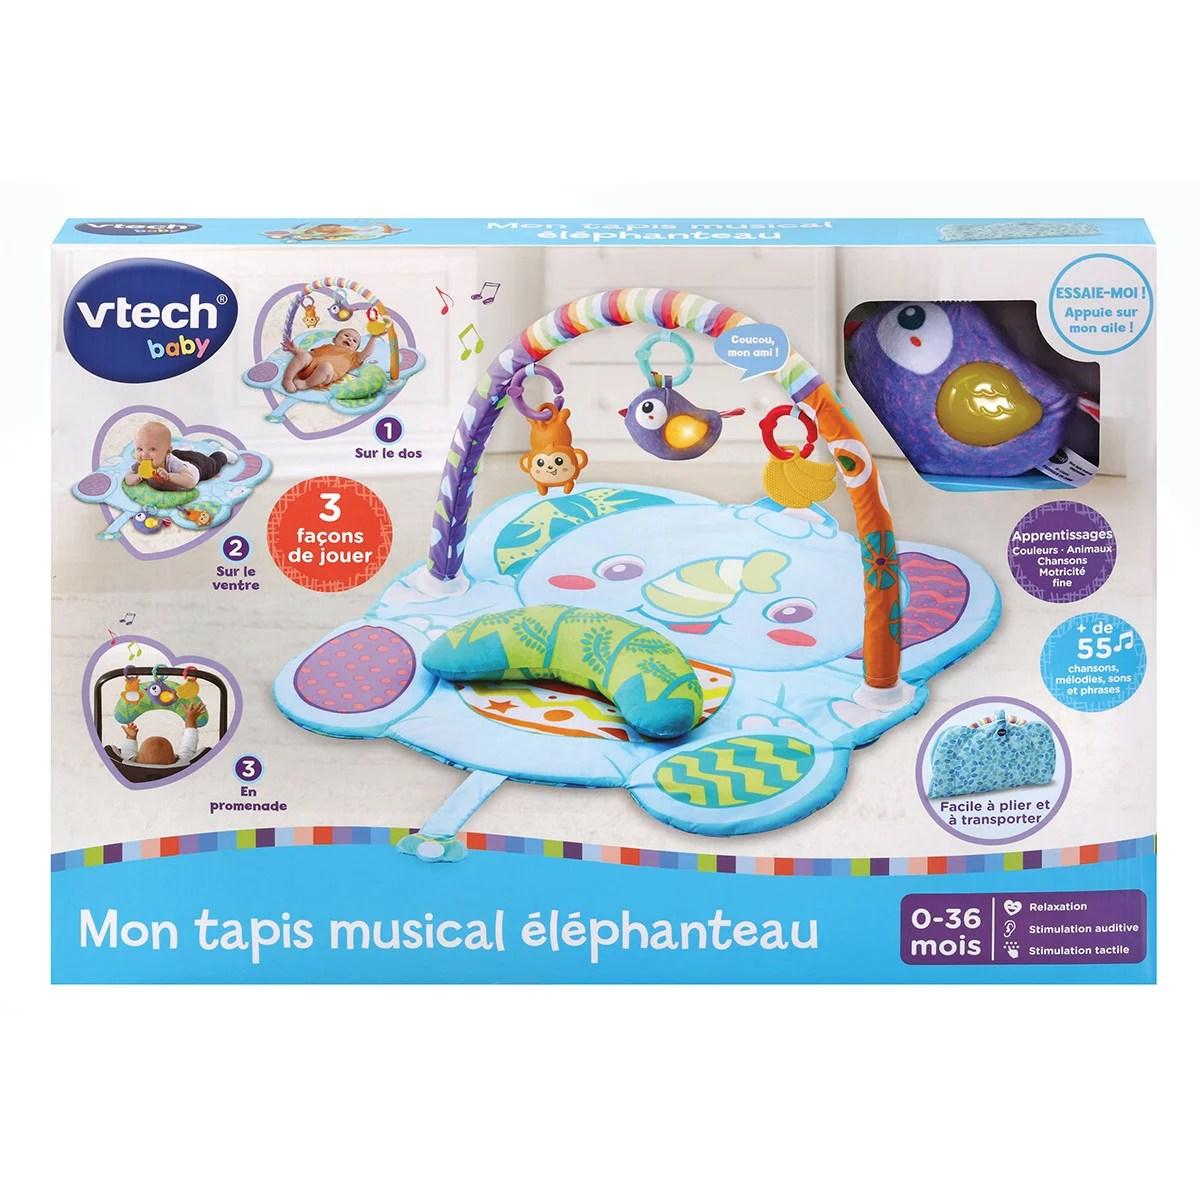 mon tapis musical elephanteau